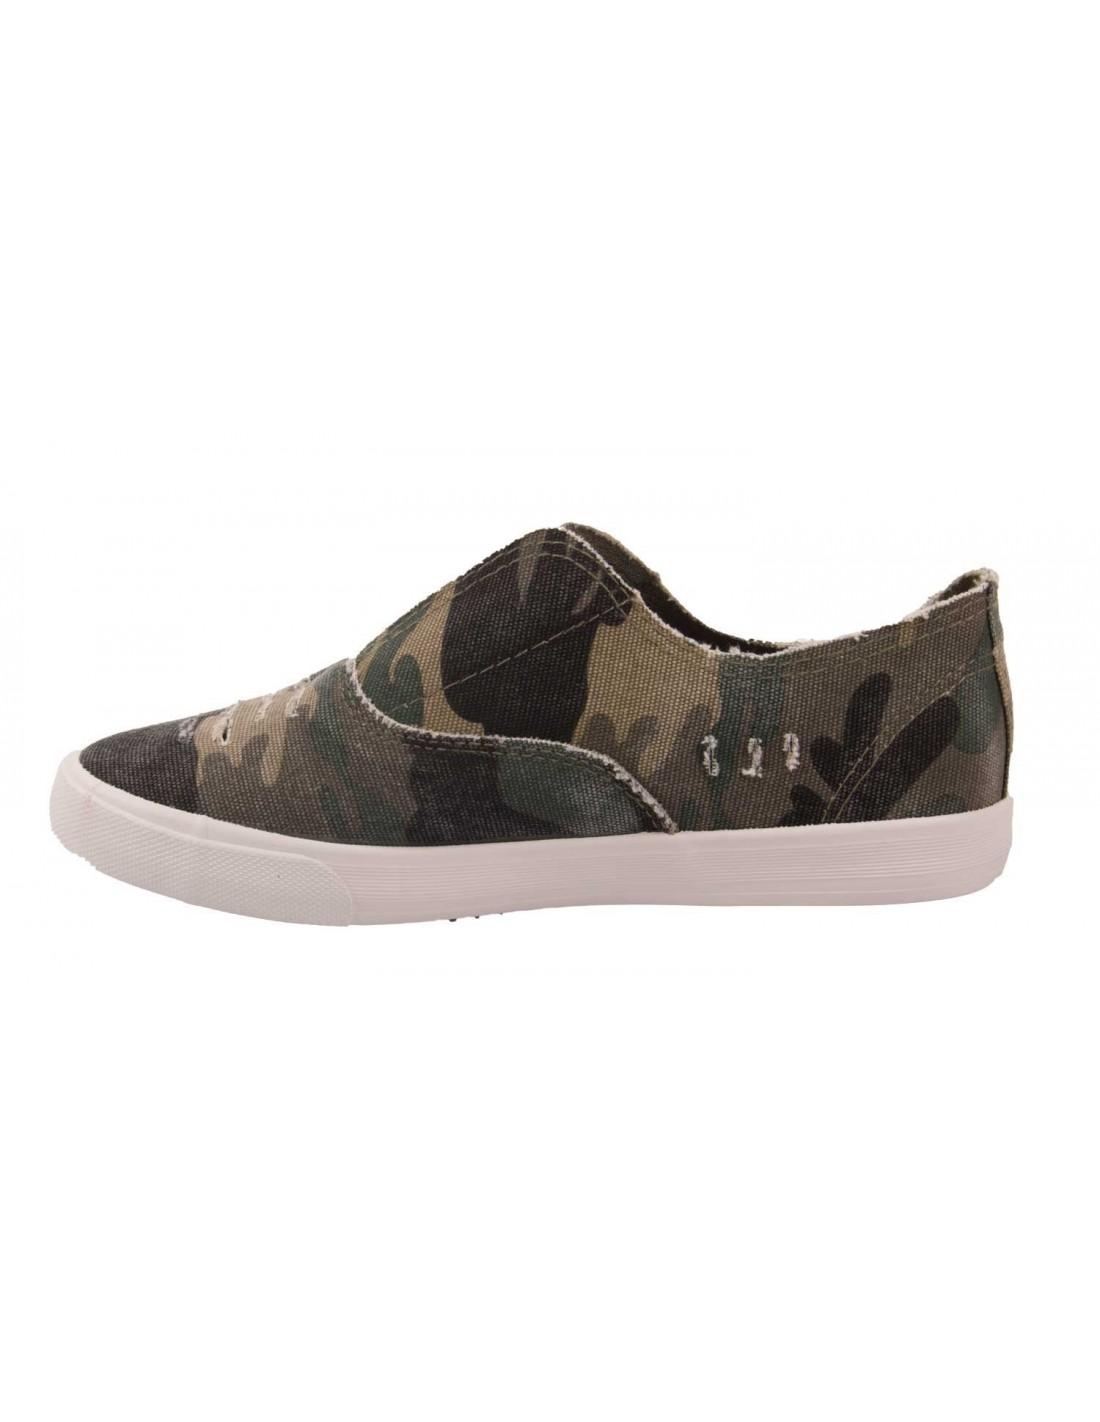 slip on femme militaire basket toile plate motif army camouflage. Black Bedroom Furniture Sets. Home Design Ideas